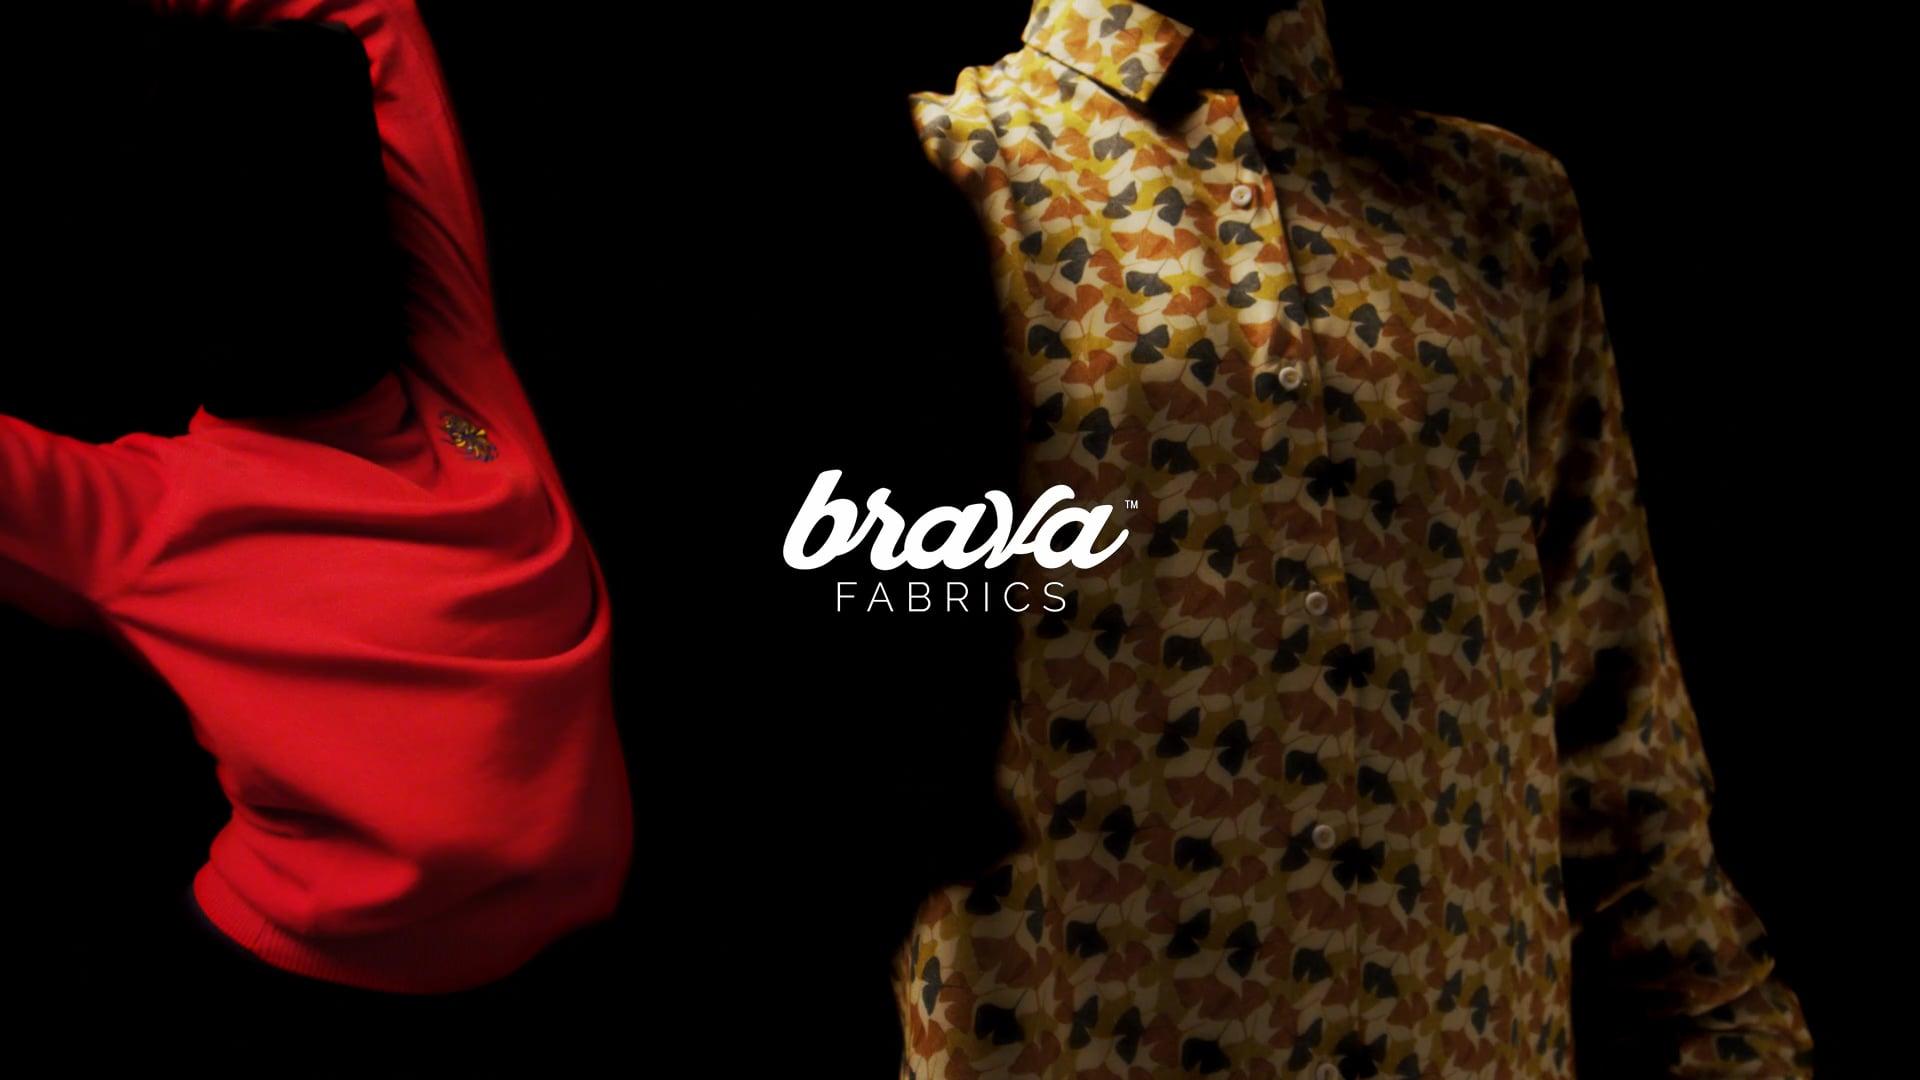 ANUNCIO BRAVA FABRICS - Black Friday